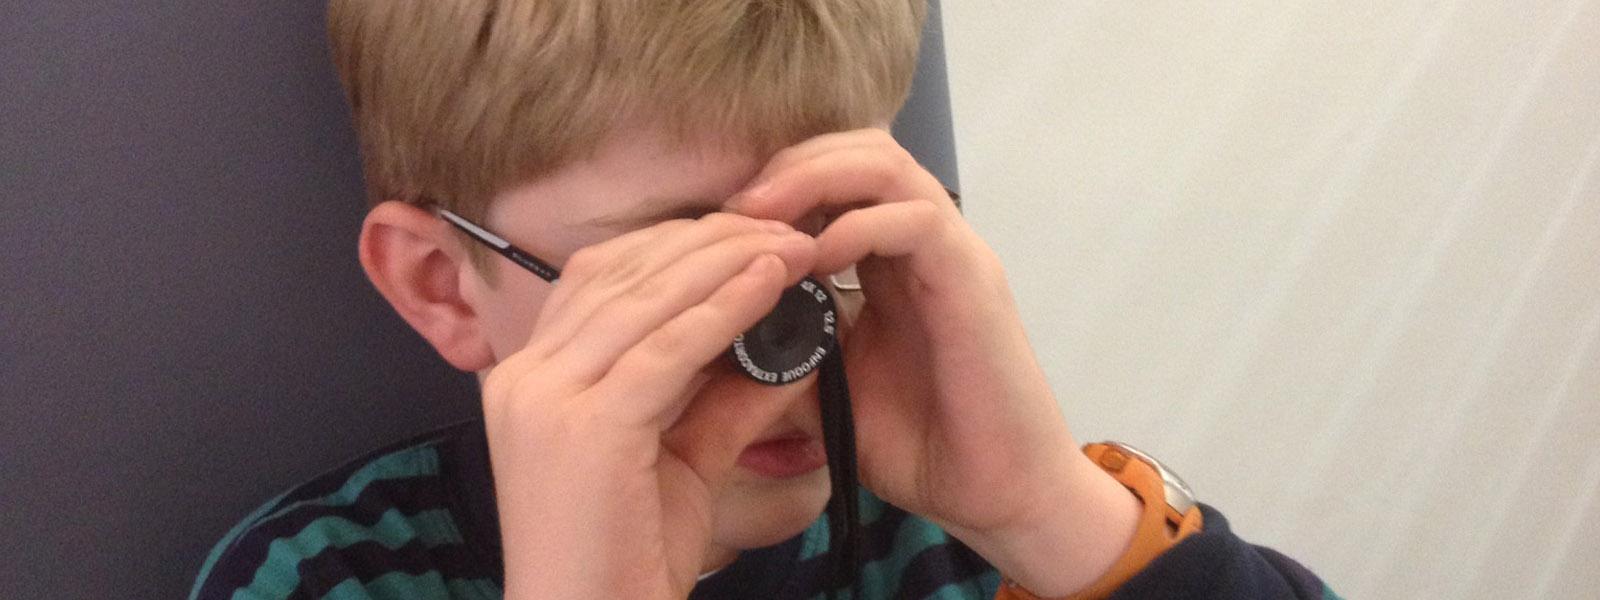 baja visión ir a clase